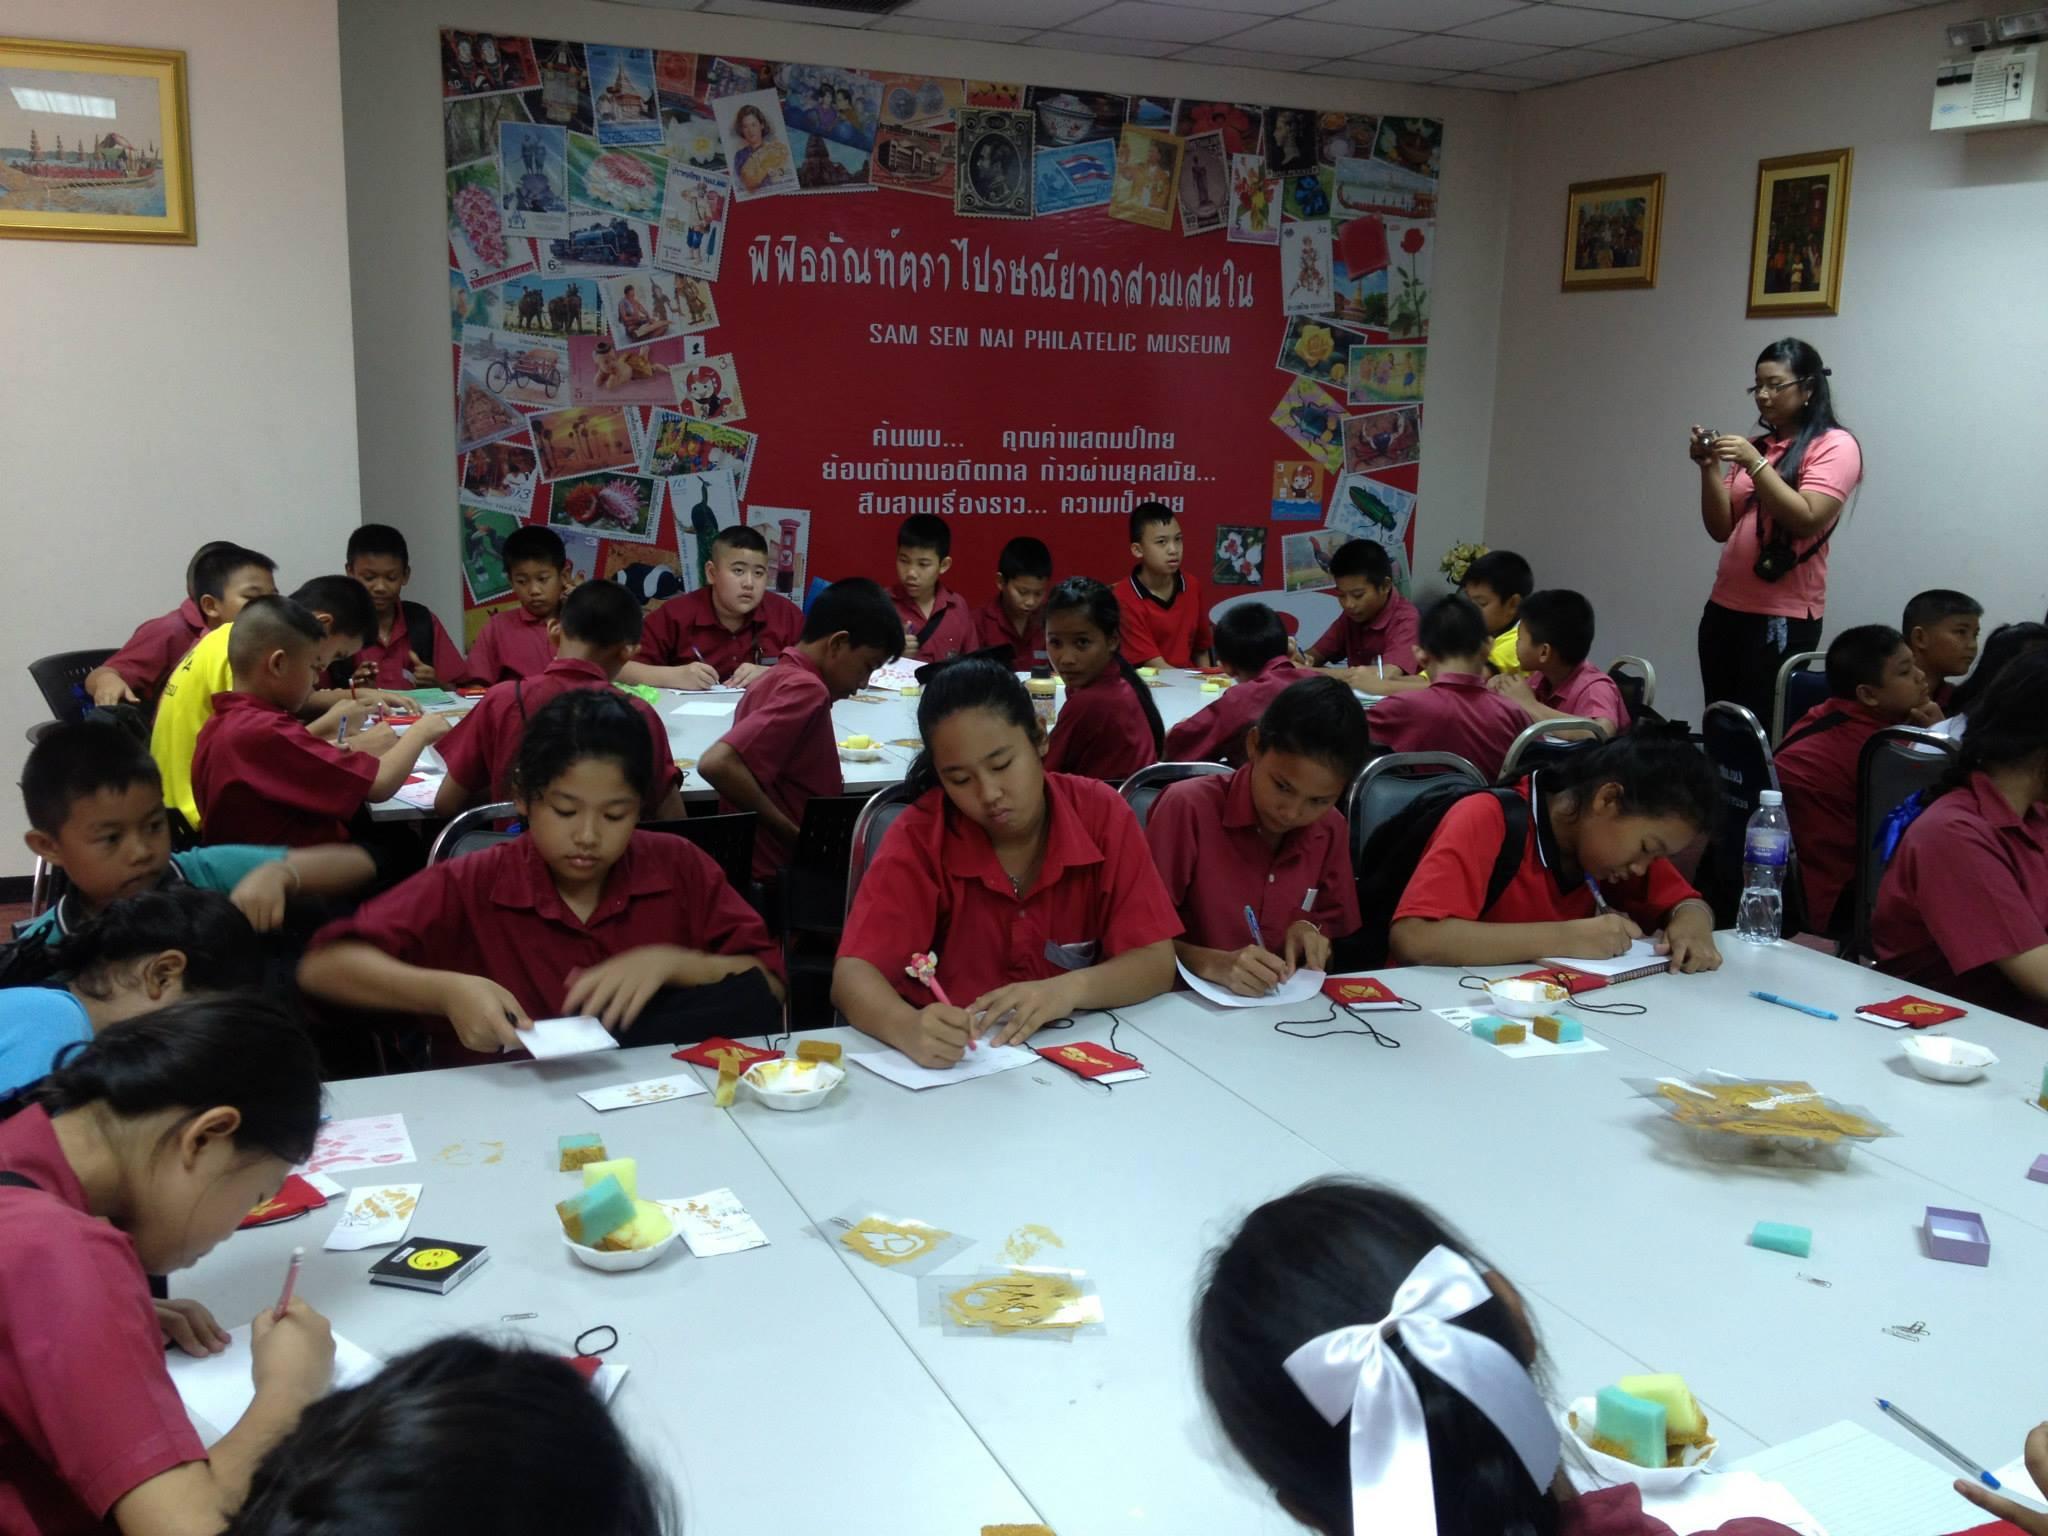 Thai schoolchildren at Sam Sen Nai Philatelic Museum during a visit to Bangkok to attend the Thailand 2013 World Stamp Exhibition in August 2013.